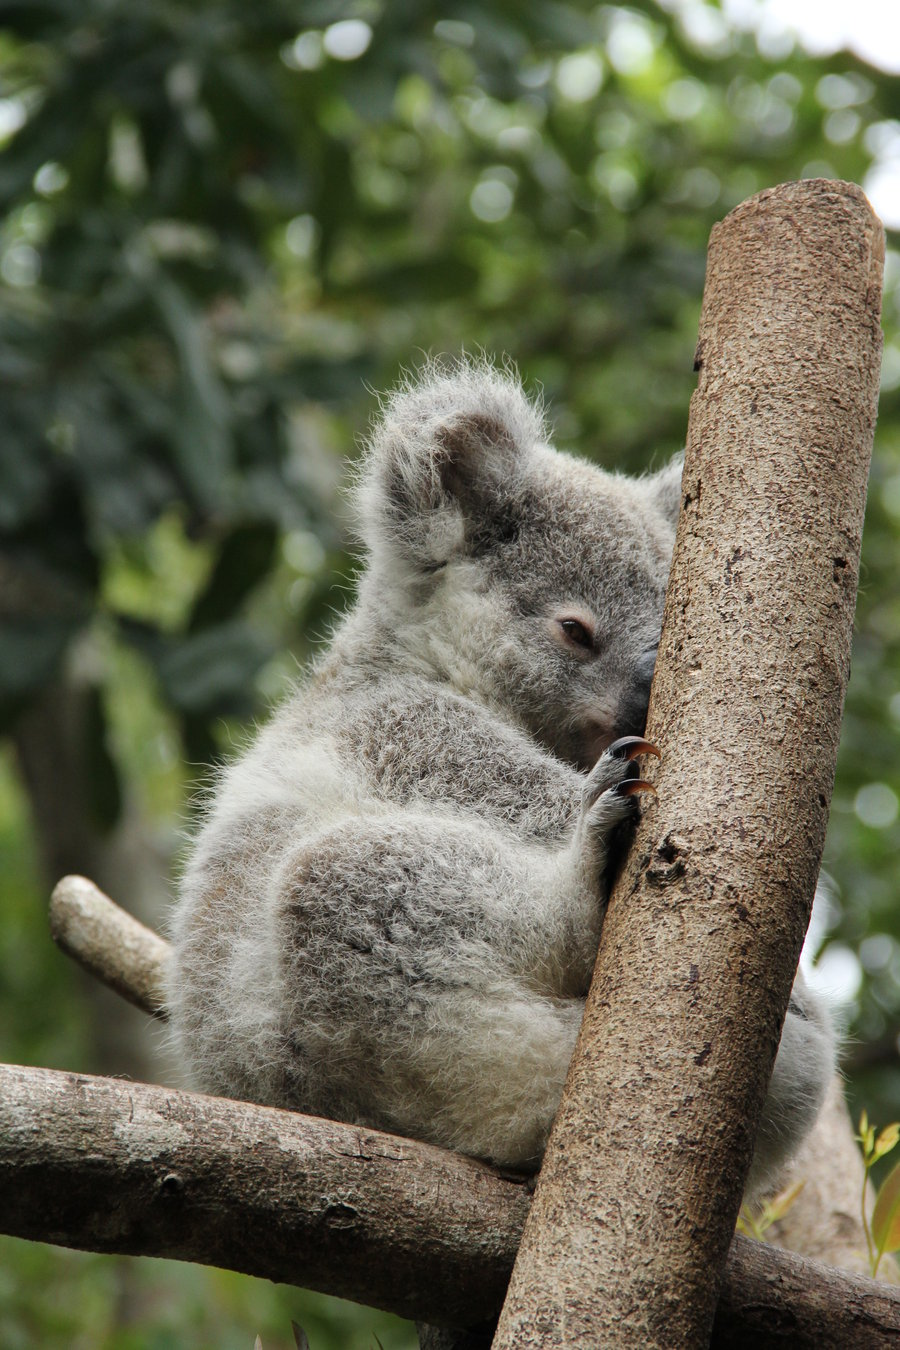 Baby Koala Wallpaper 900x1350